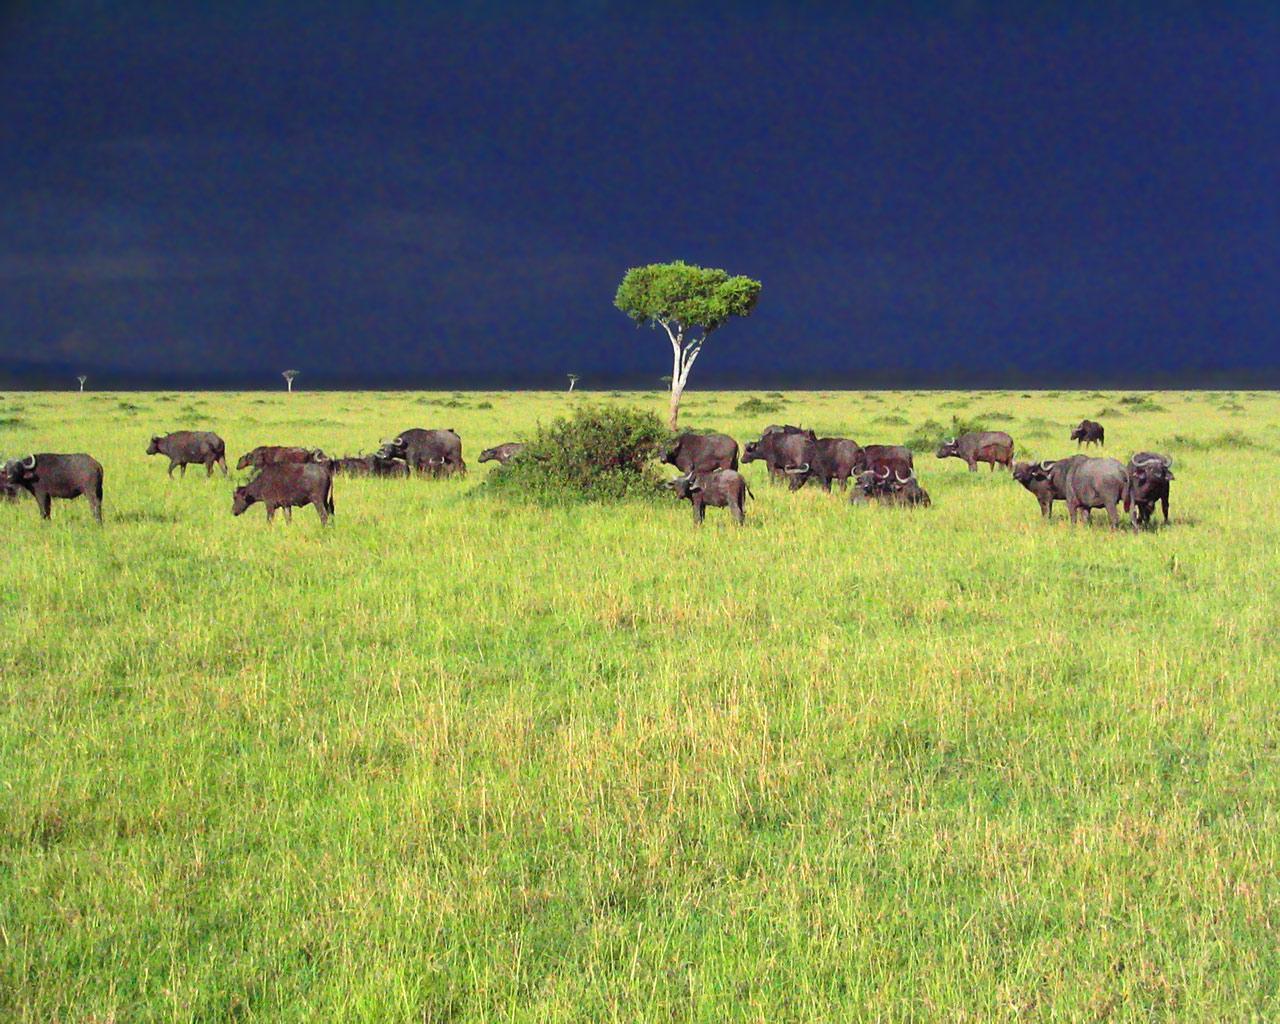 http://www.zastavki.com/pictures/1280x1024/2008/World_Africa_Savannah_Storm_007473_.jpg